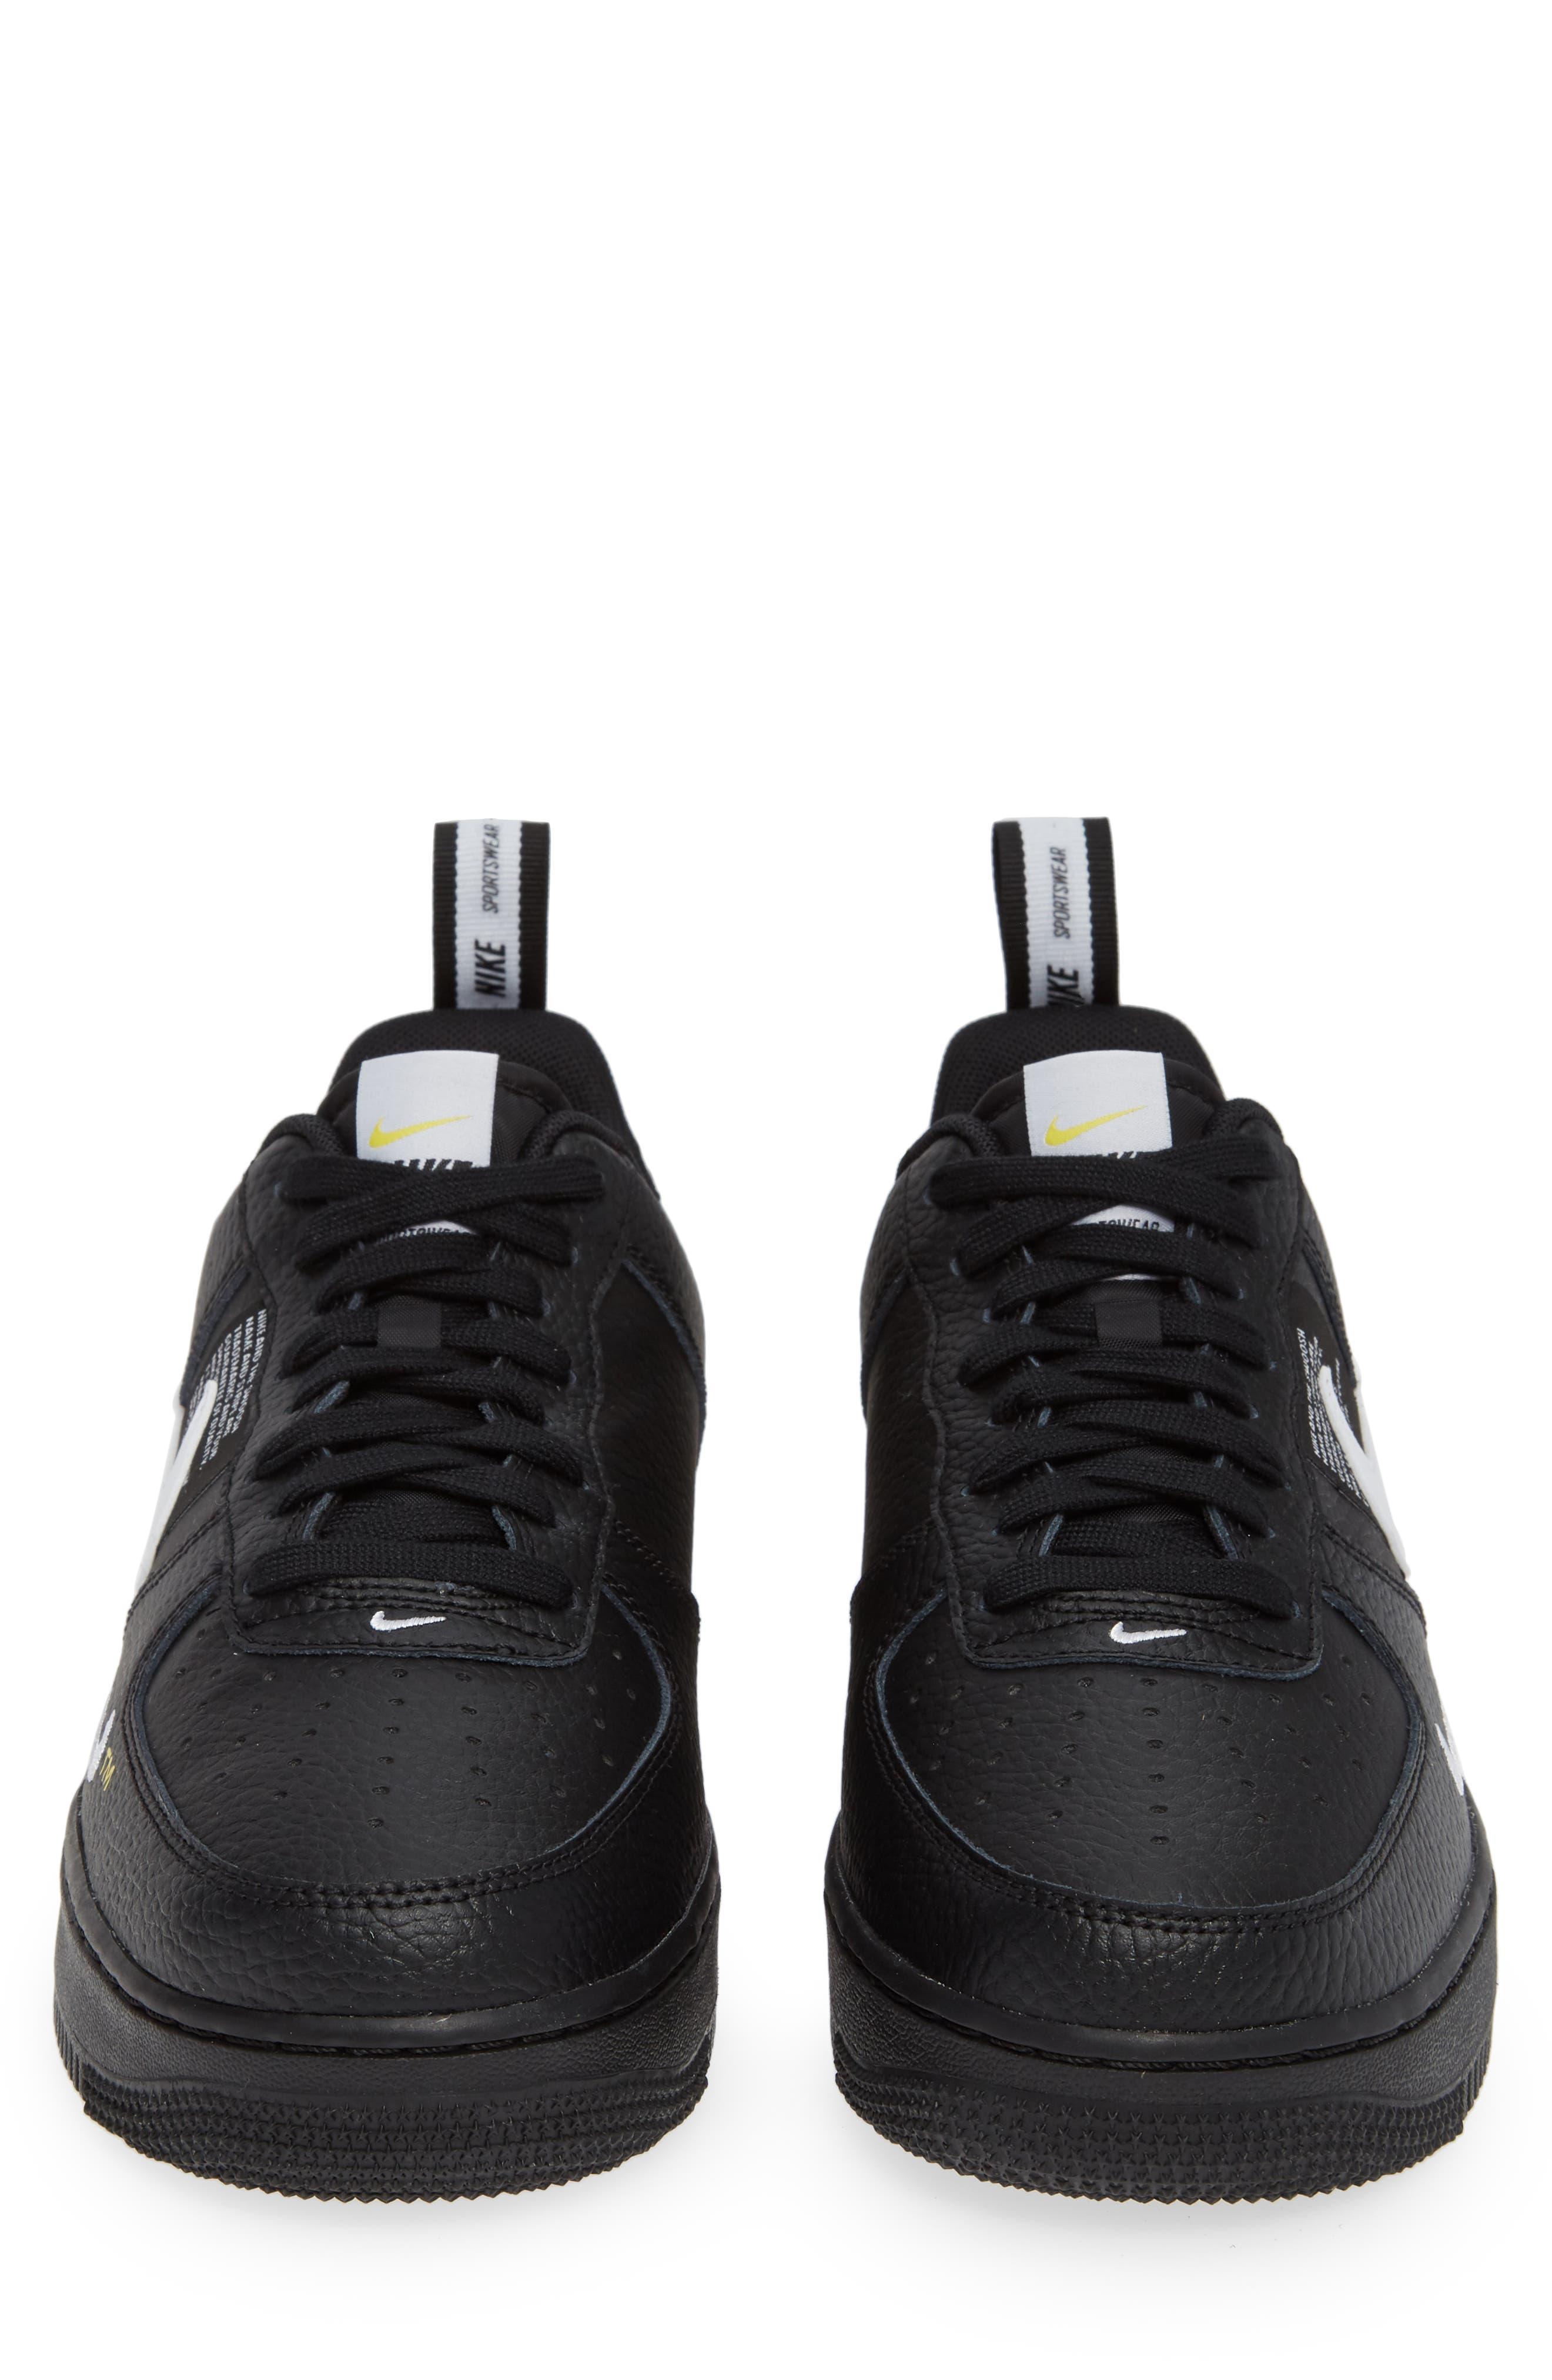 Air Force 1 '07 LV8 Utility Sneaker,                             Alternate thumbnail 5, color,                             BLACK/ WHITE/ TOUR YELLOW